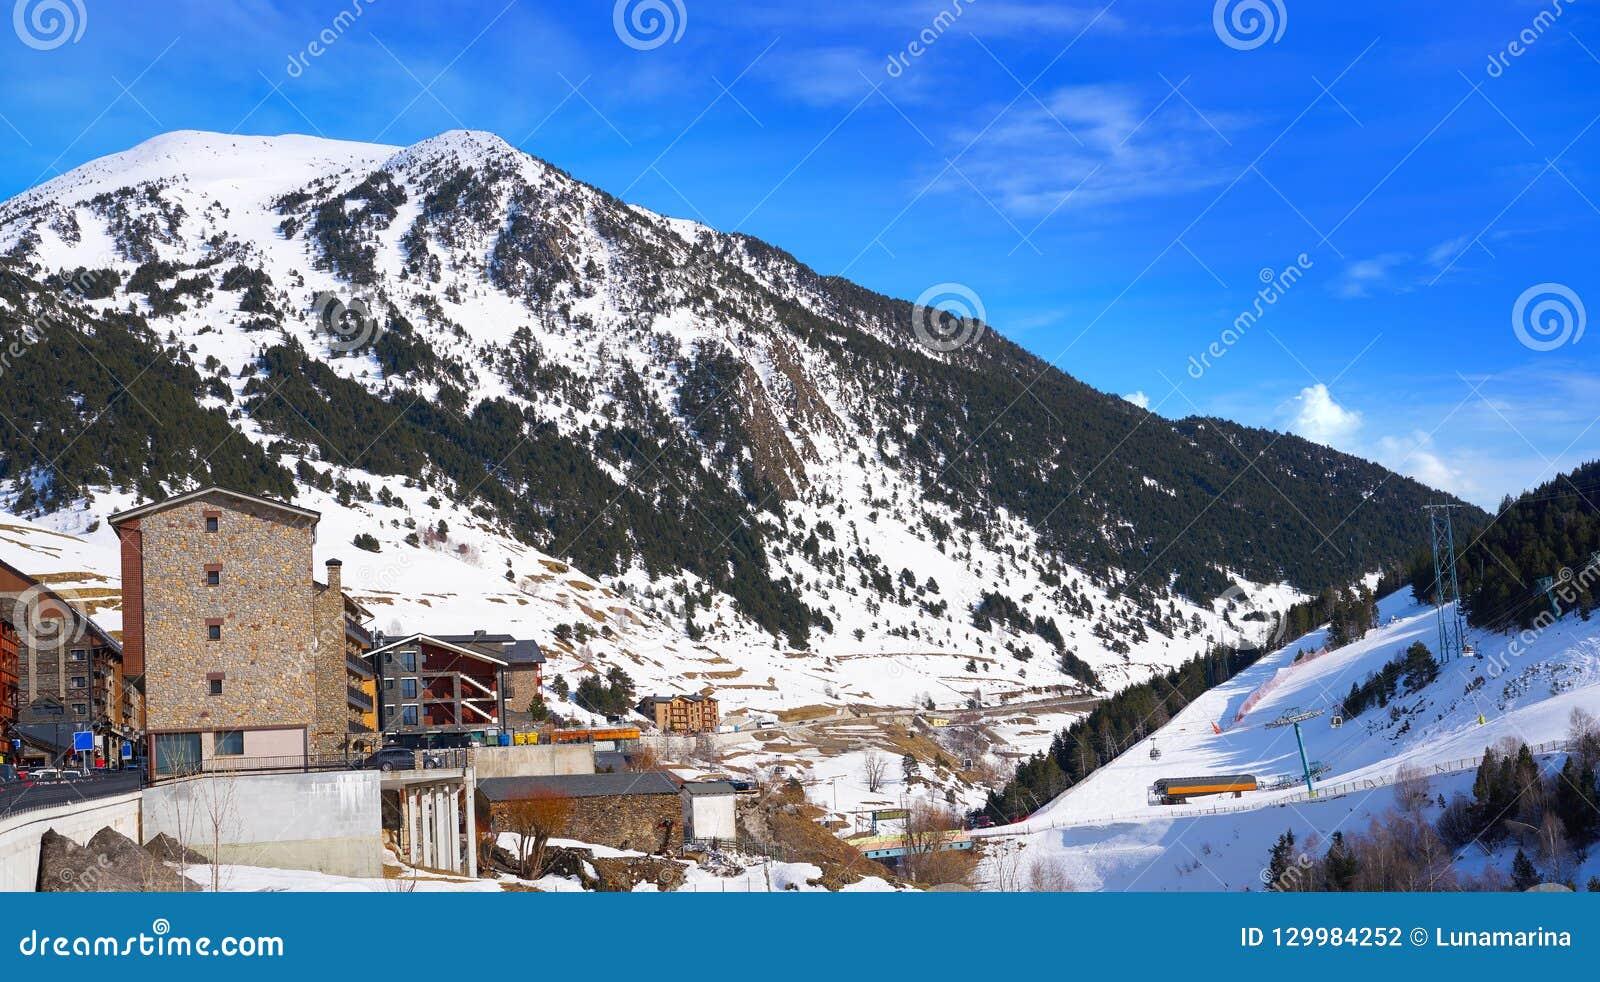 soldeu ski resort in andorra at grandvalira stock photo - image of